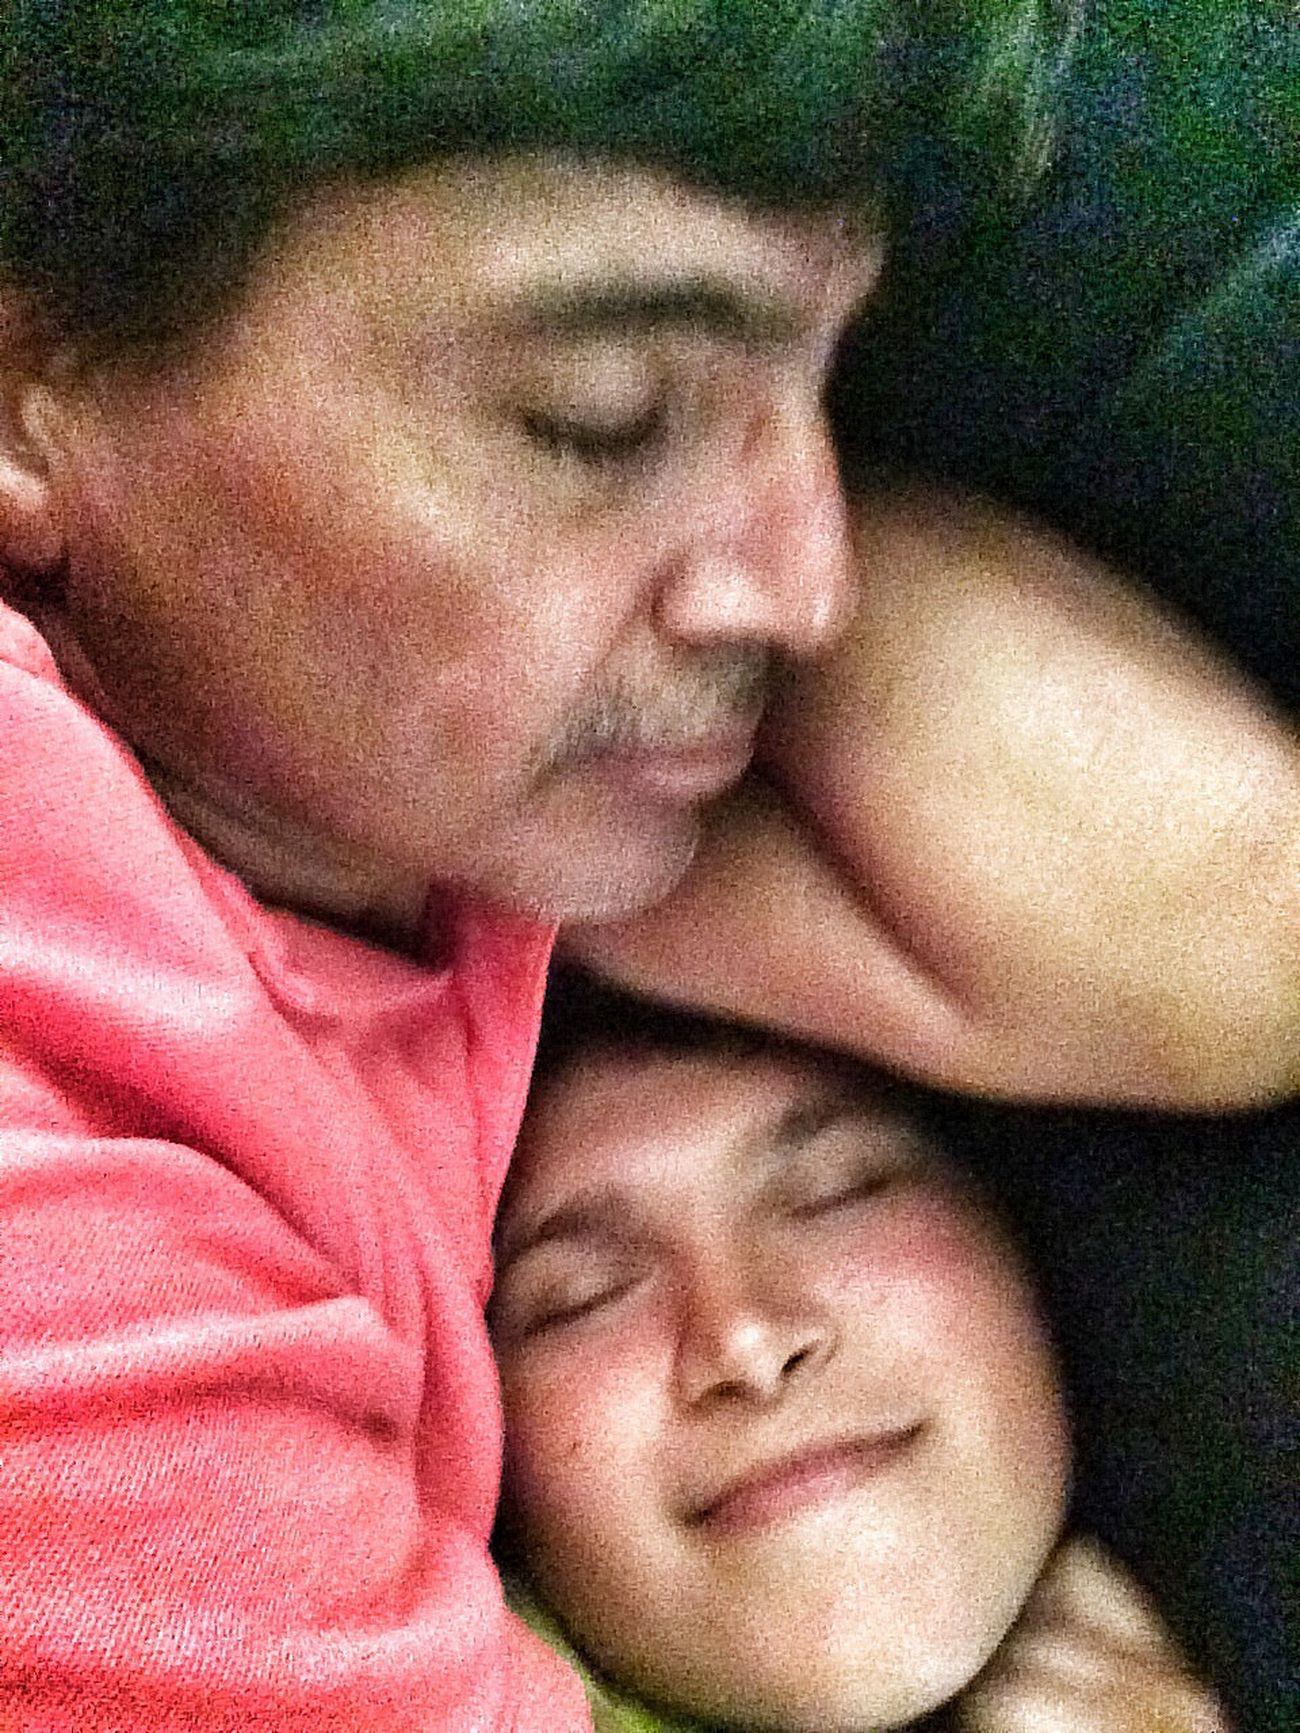 Carlos and Ernesto in love... Gay Lovers Boyfriends